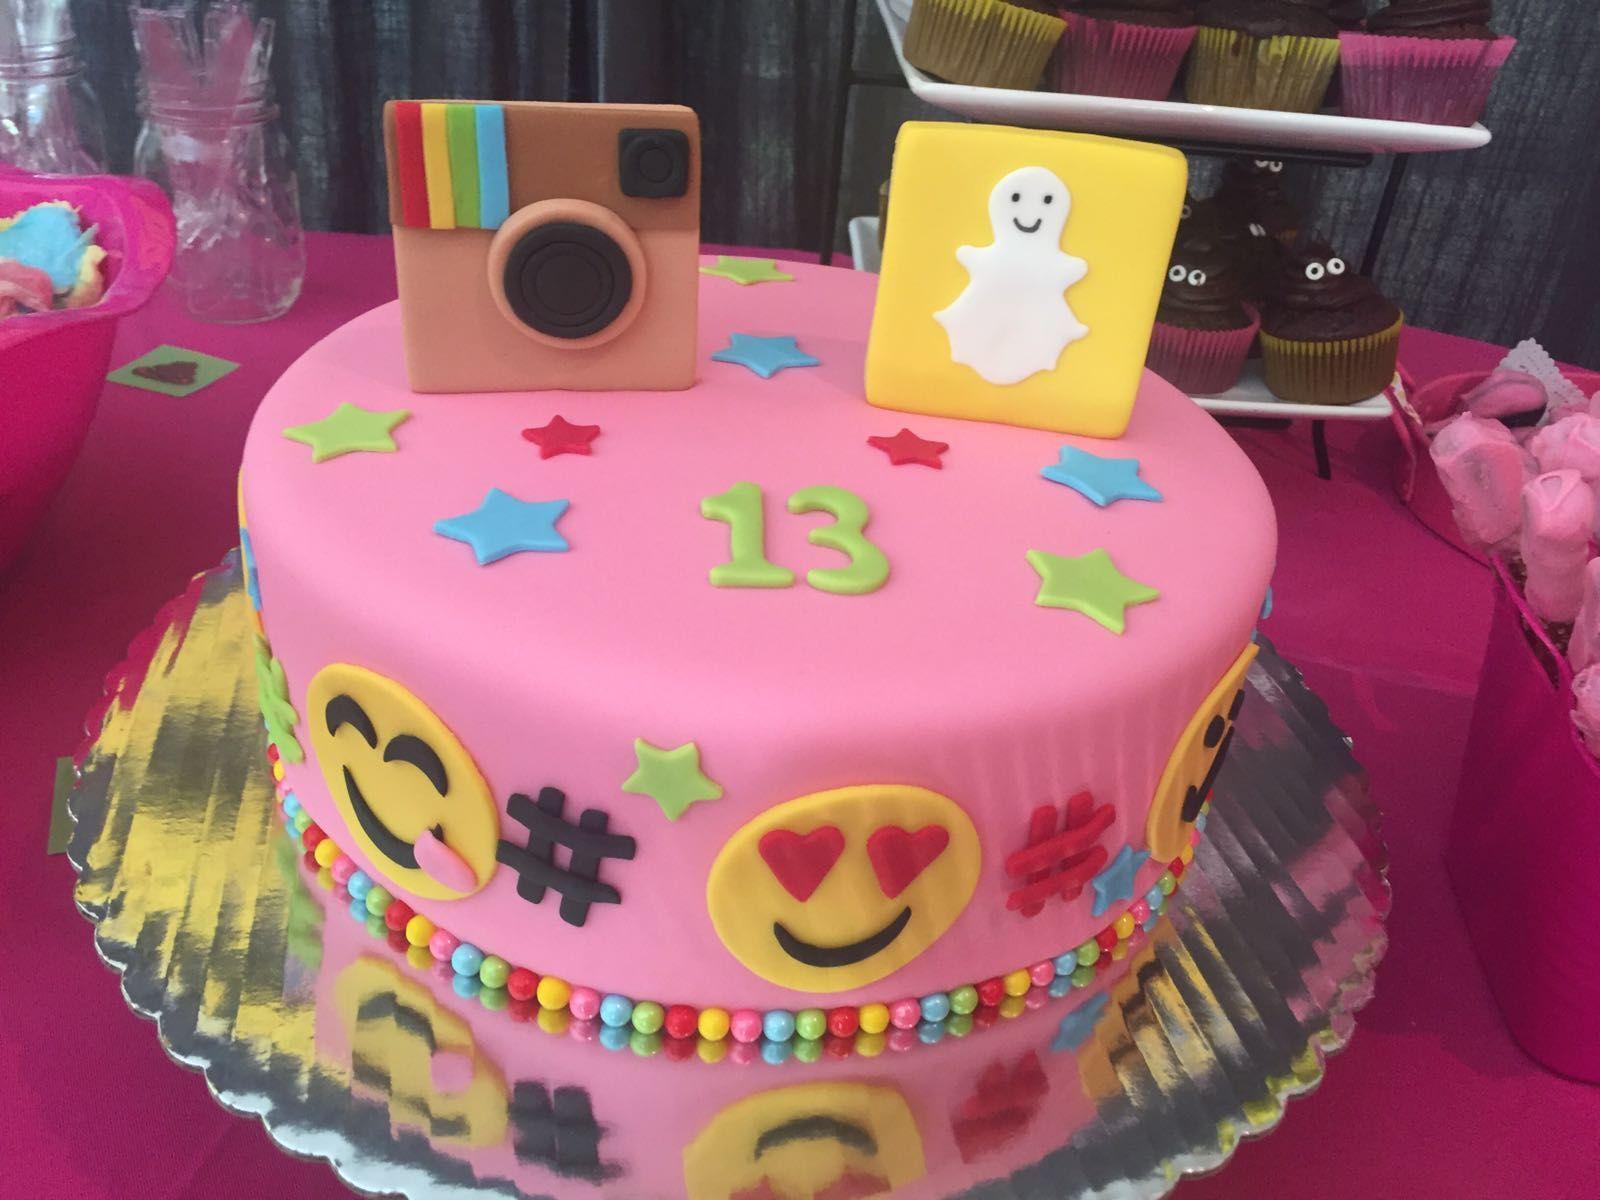 Social Media Theme Cake For A 13th Birthday Party Snapchat